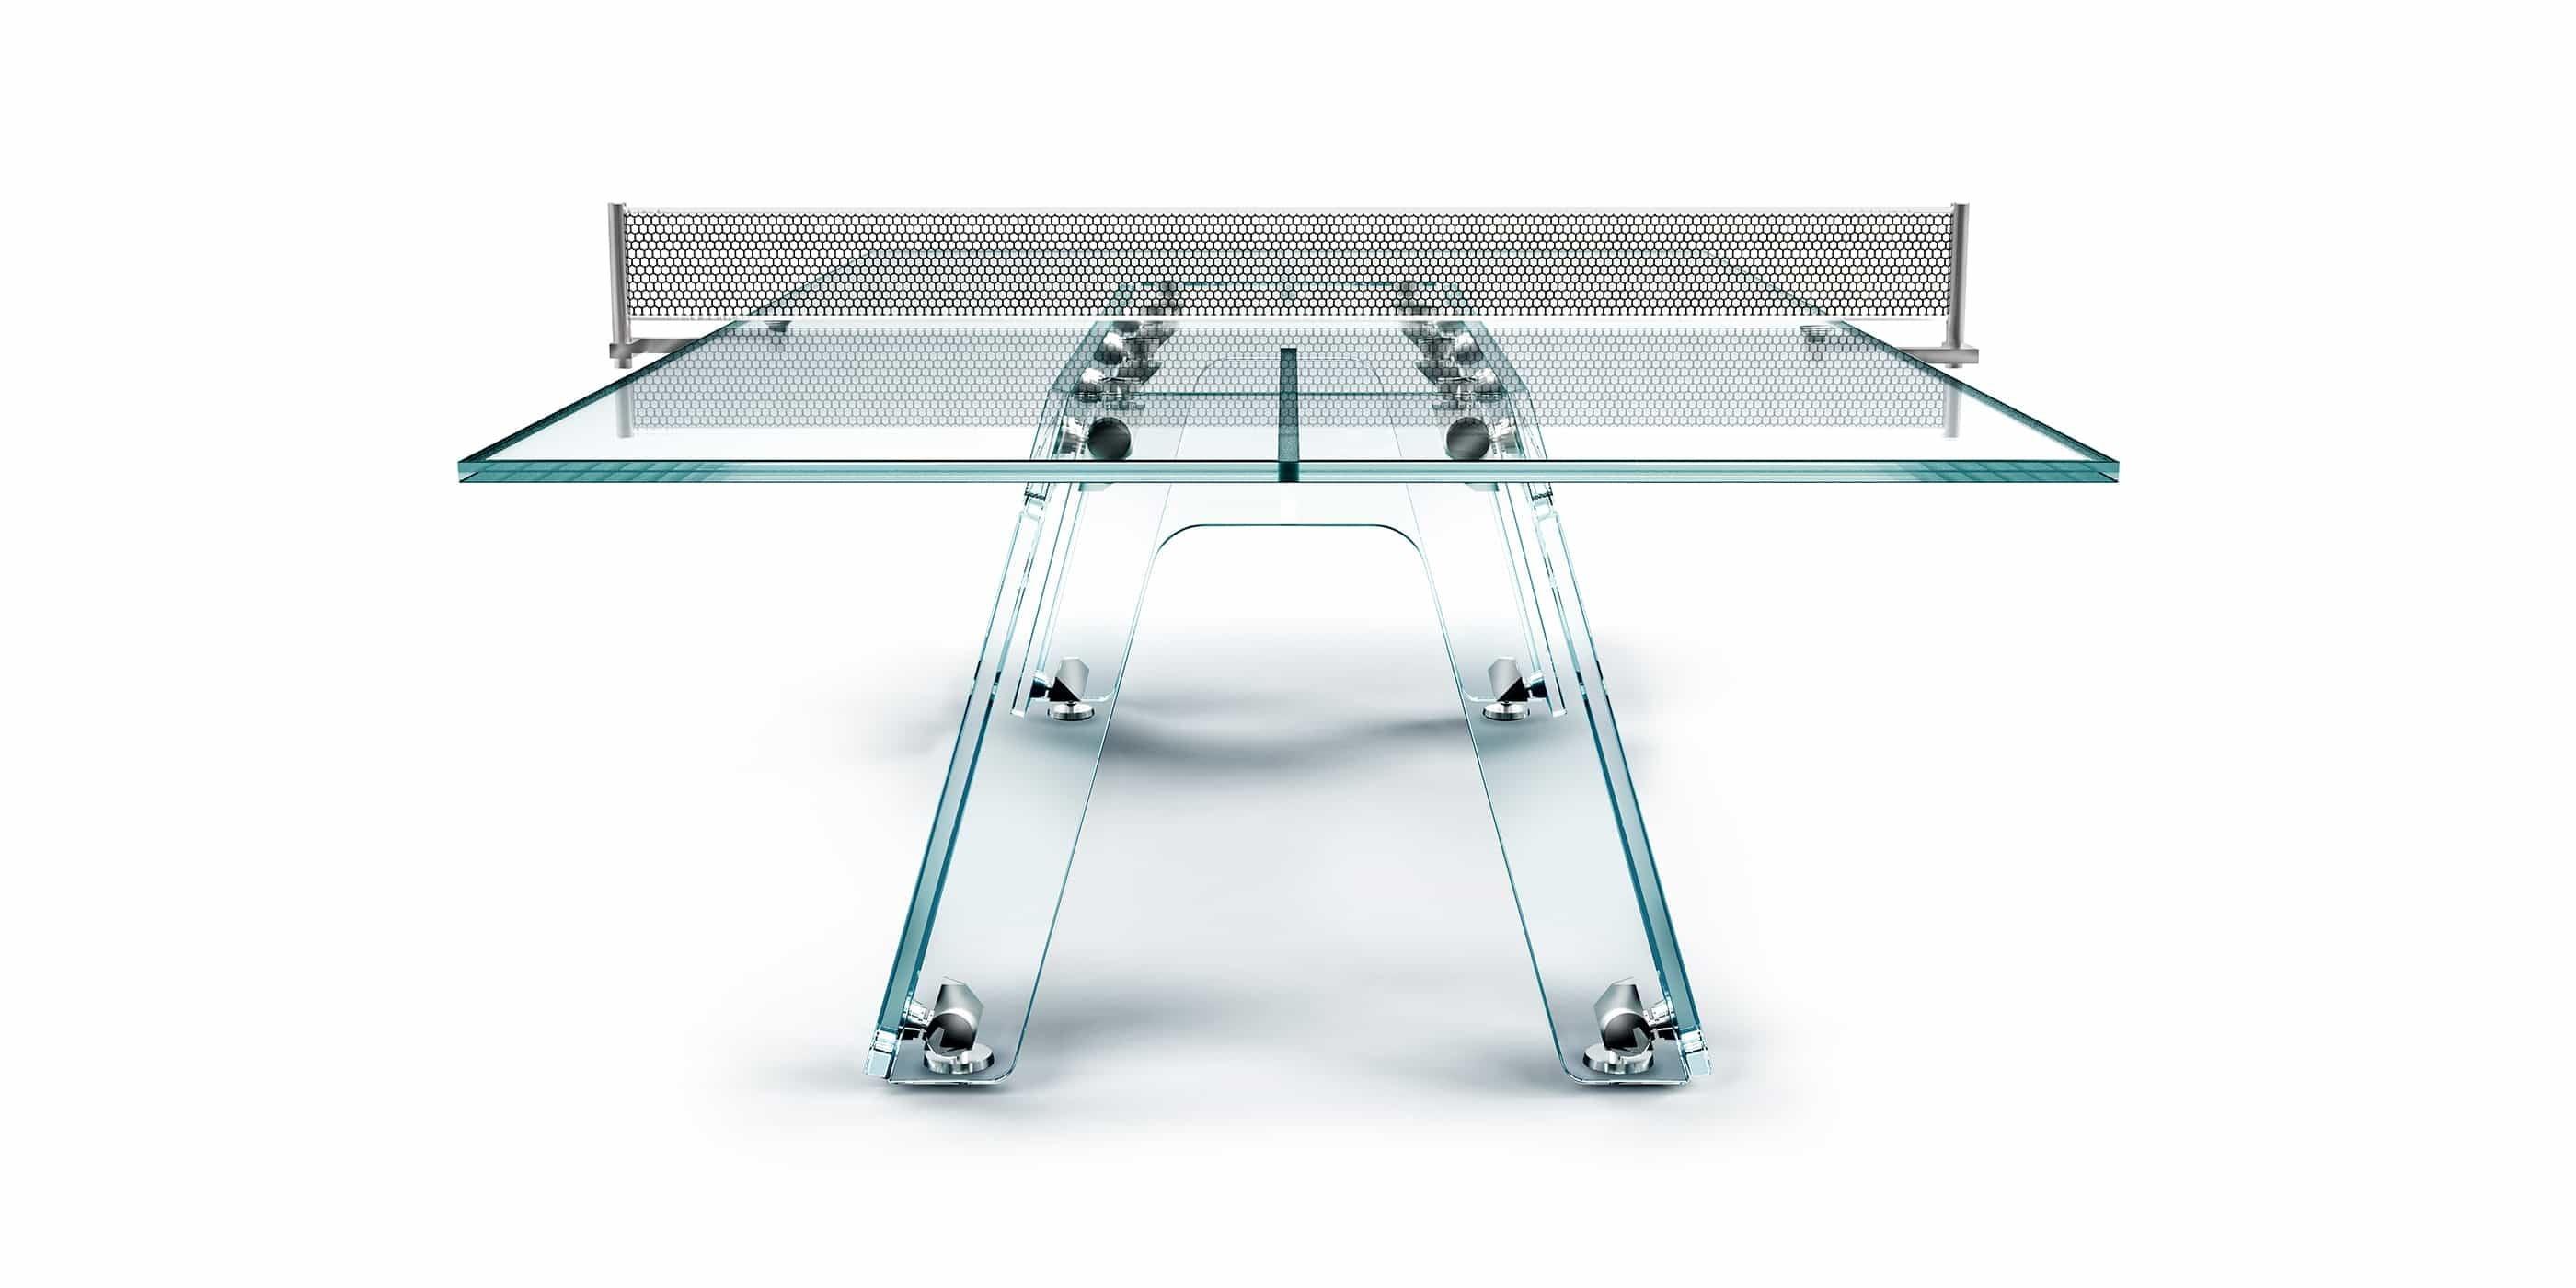 tavolo-da-pingpong-design